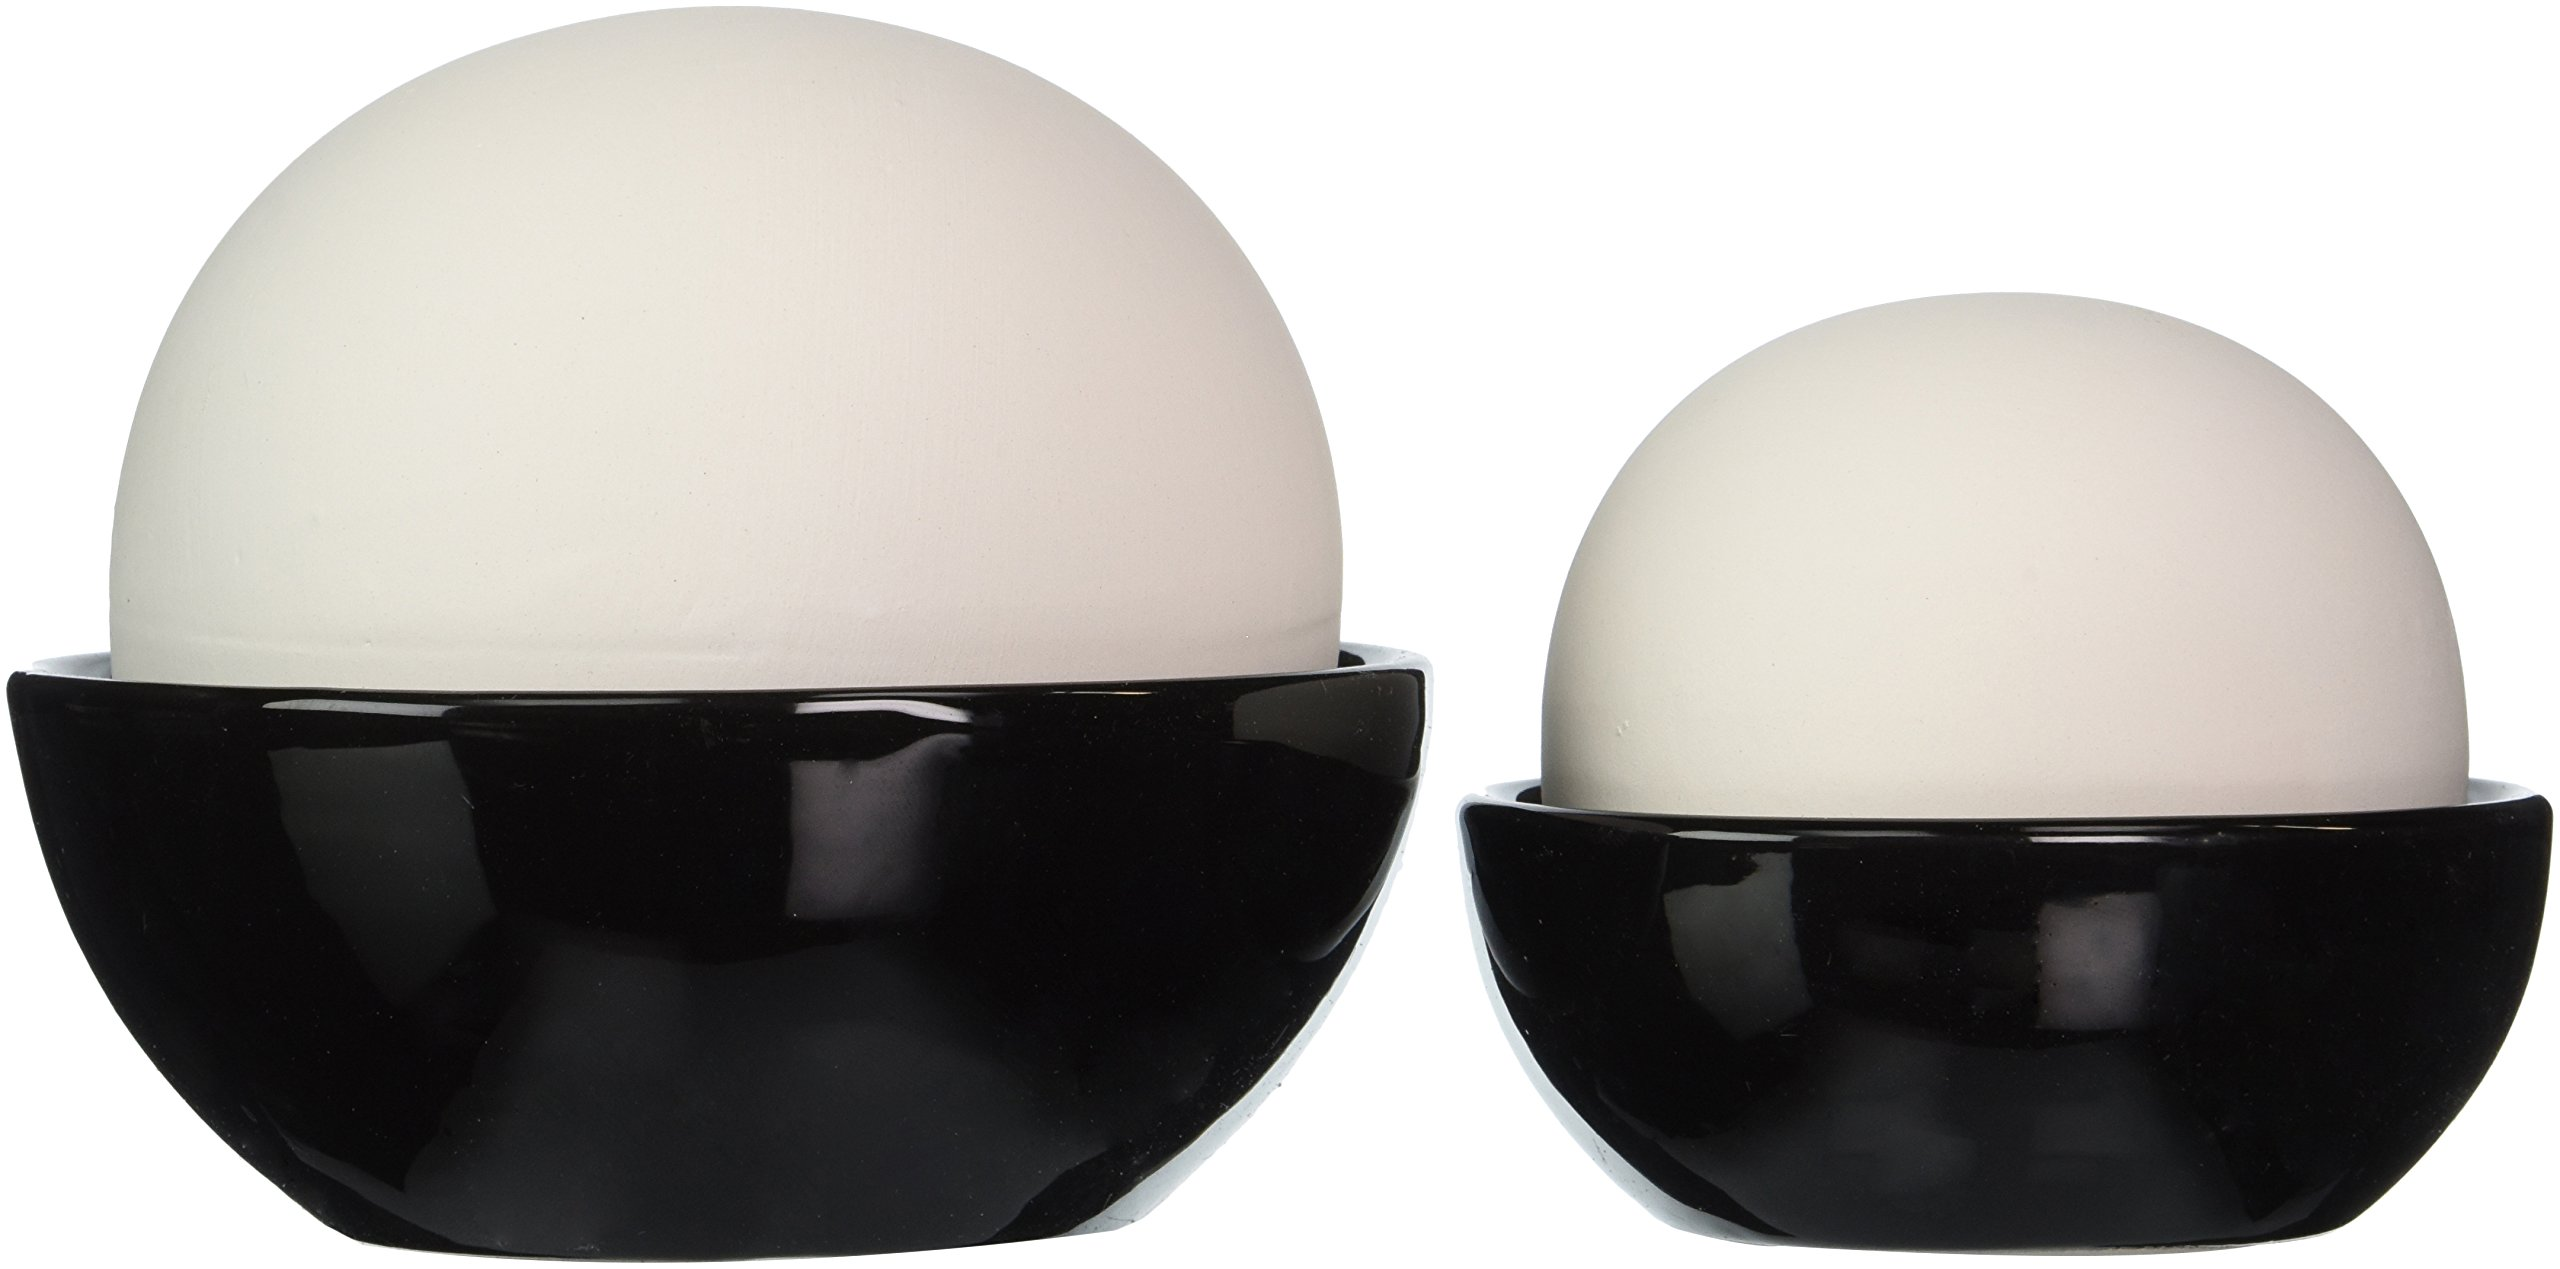 EasyComforts Room Humidifiers, Set of 2